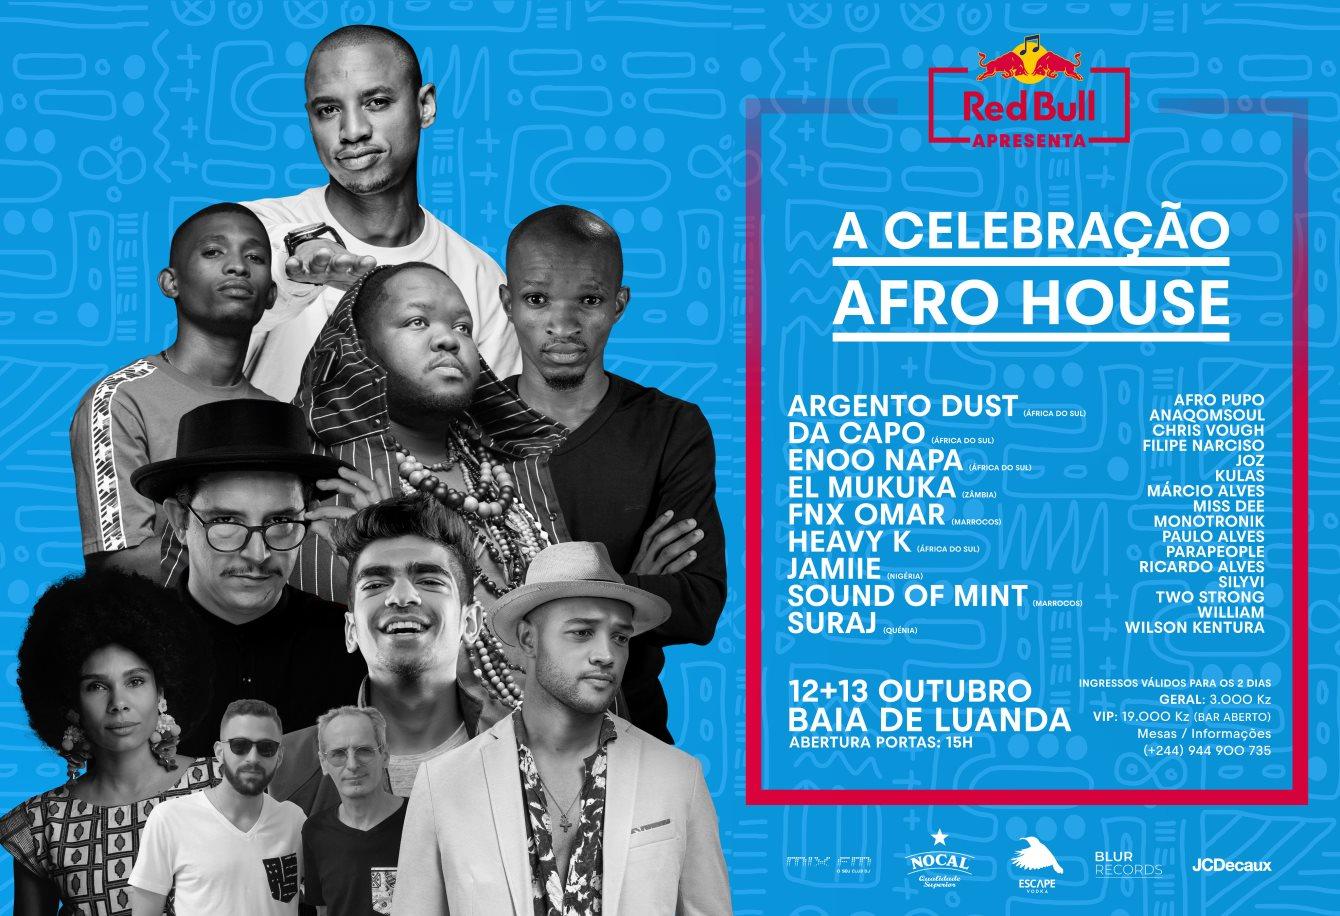 Redbull Apresenta: Celebração Afro-House - Flyer front